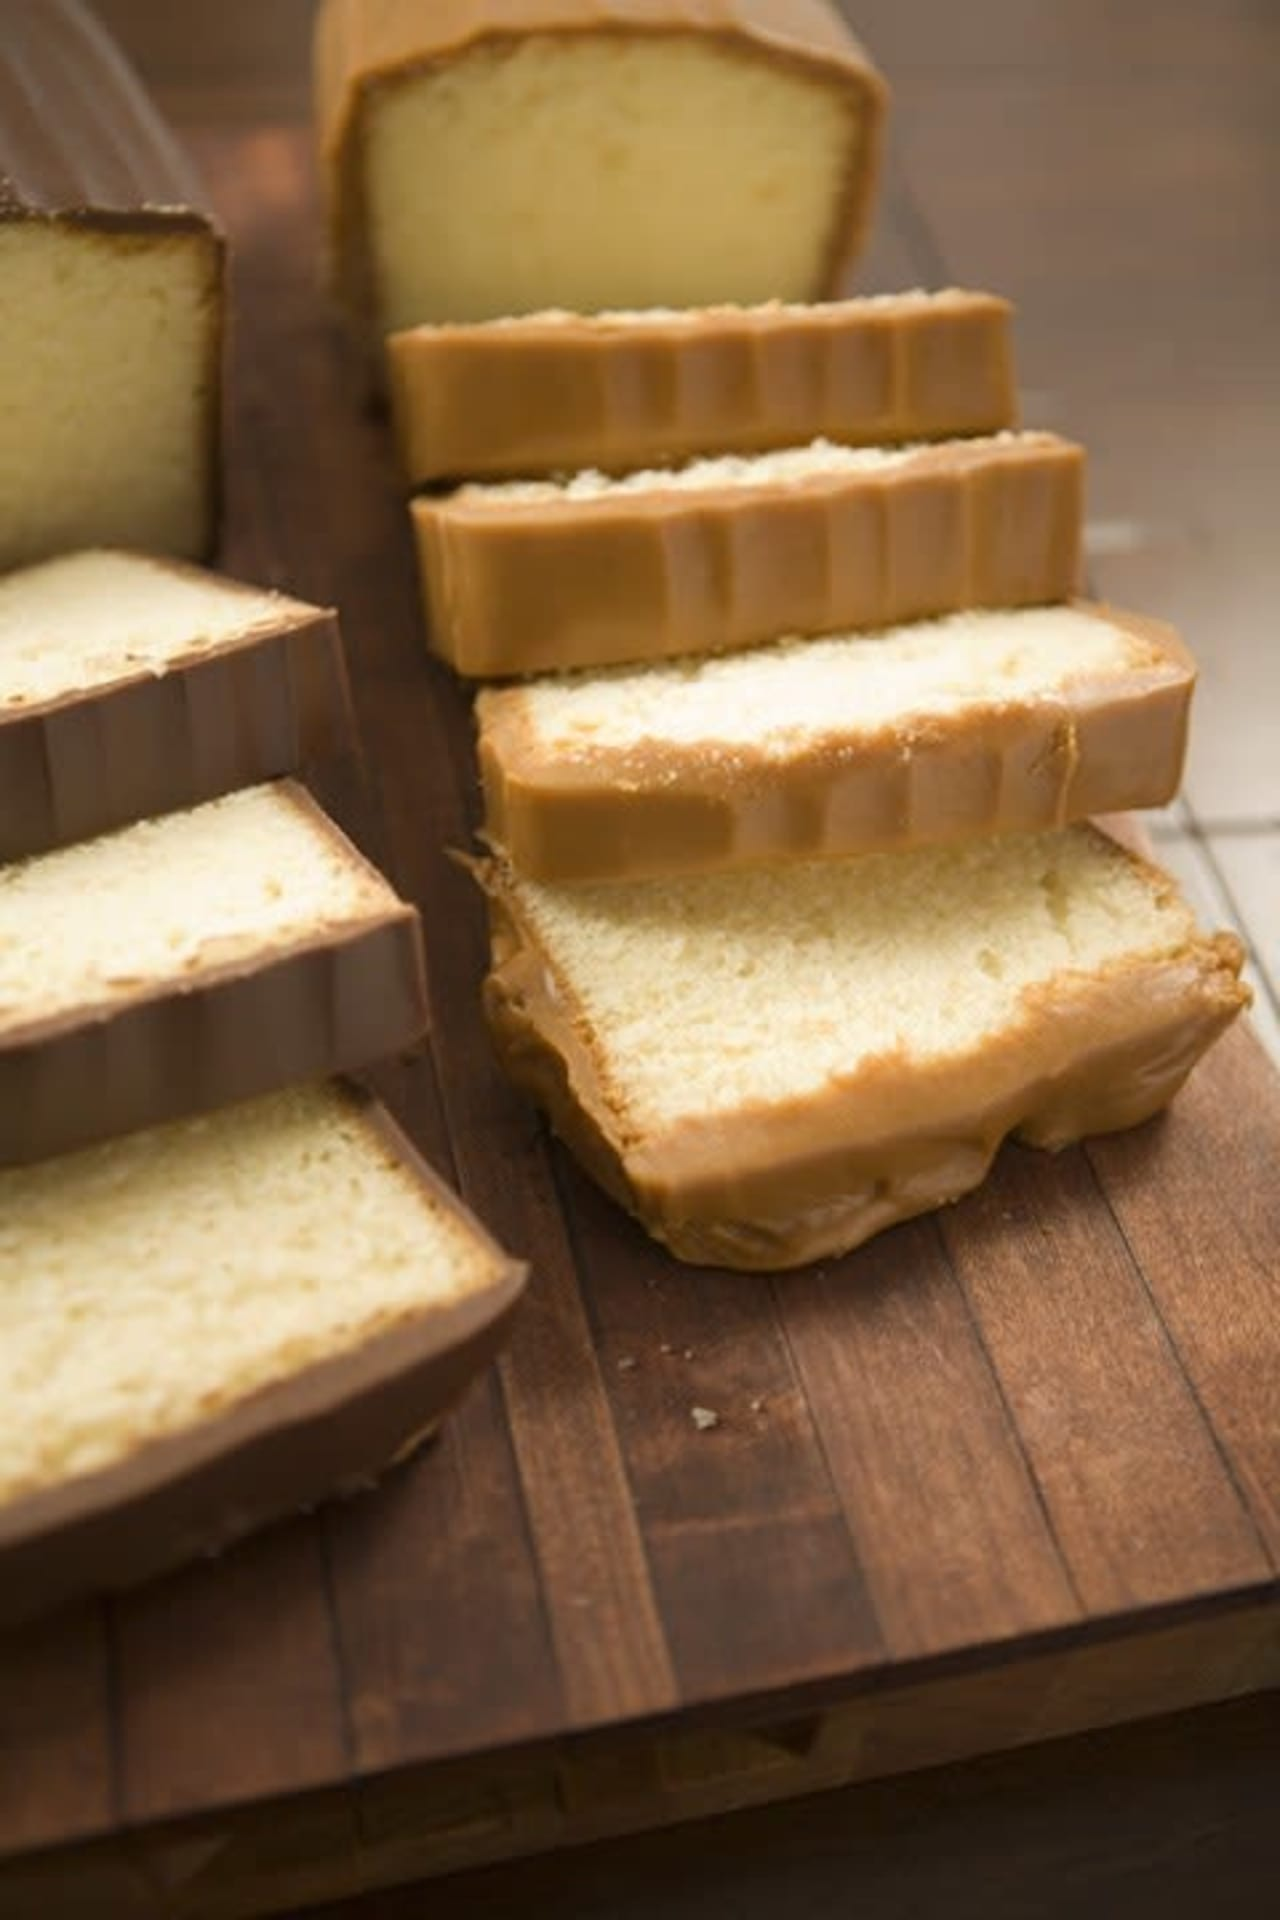 Plain Pound/Caramel Icing